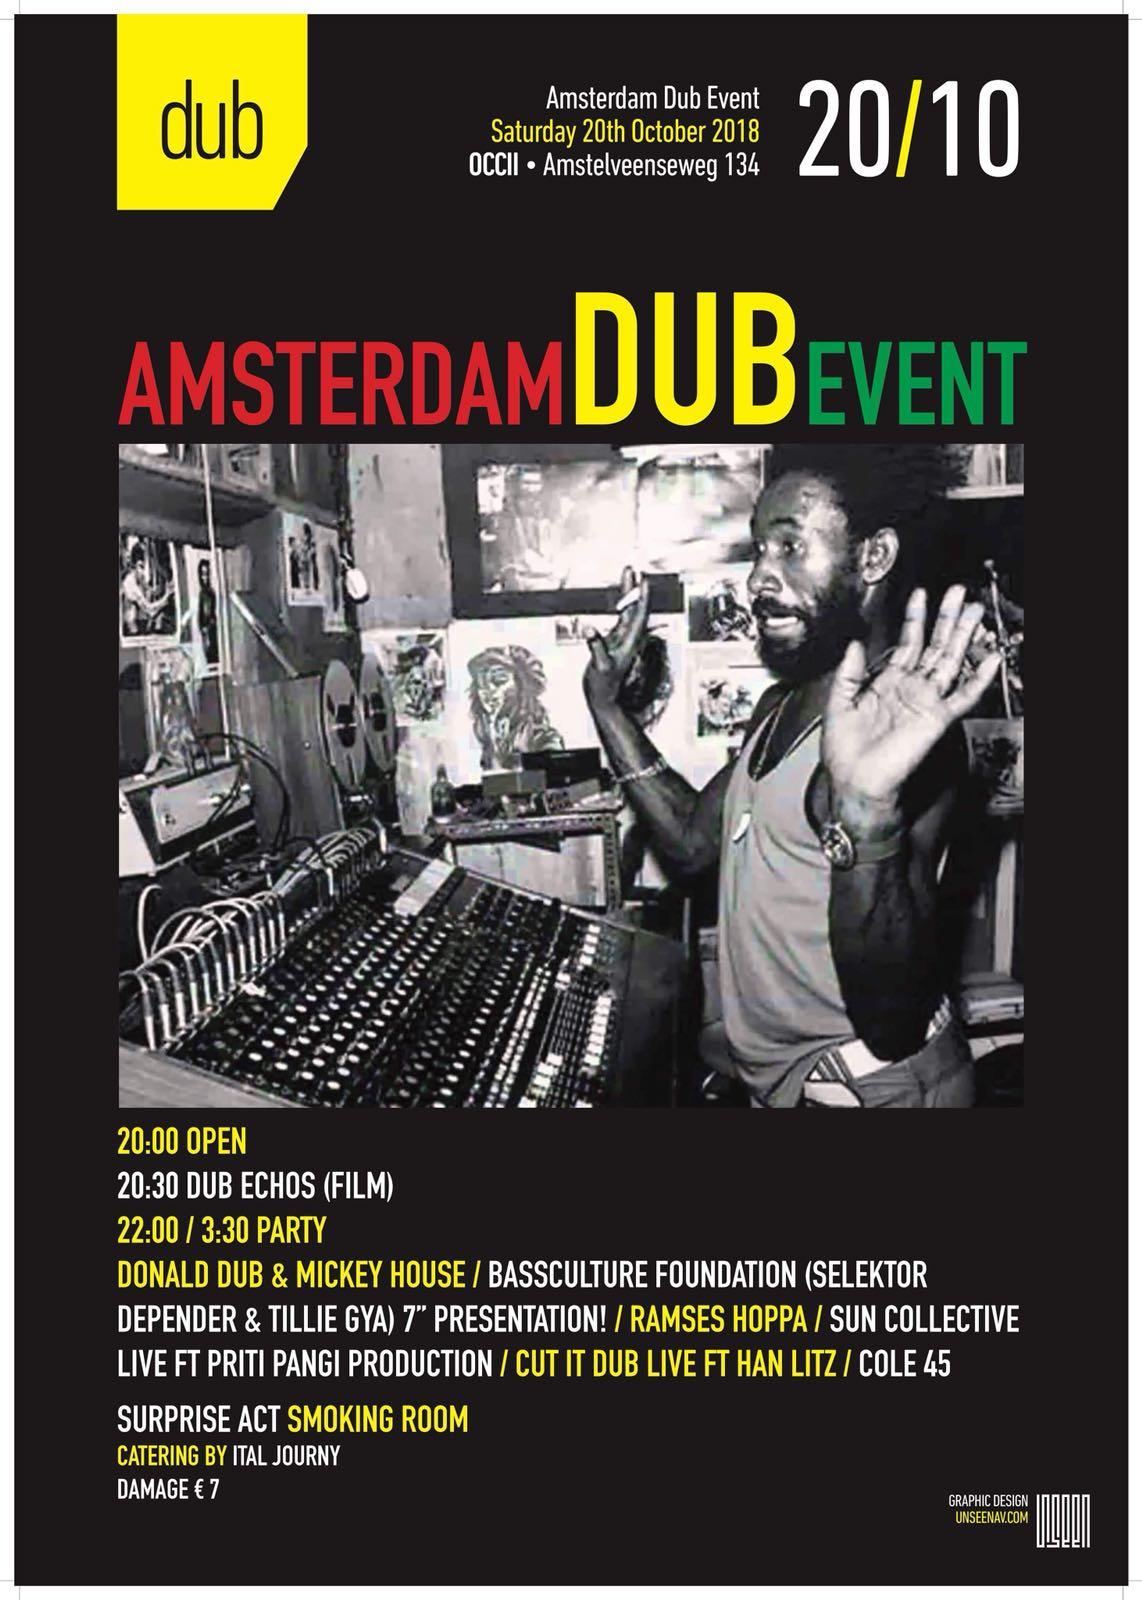 Amsterdam Dub Event 20/10